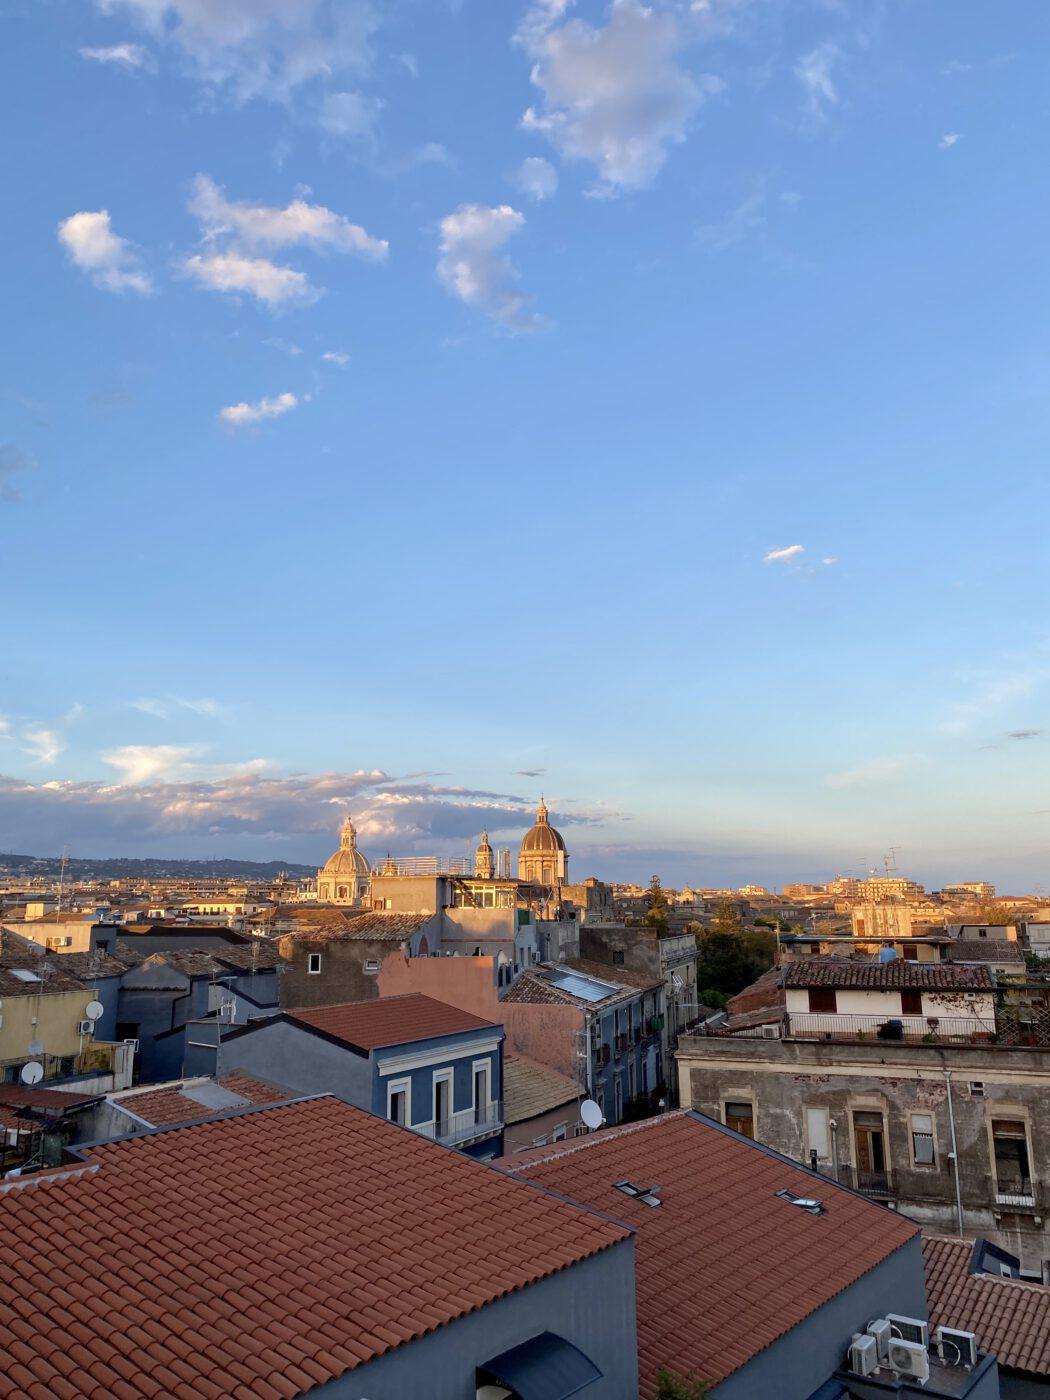 Catania - The most interesting destination in Sicily